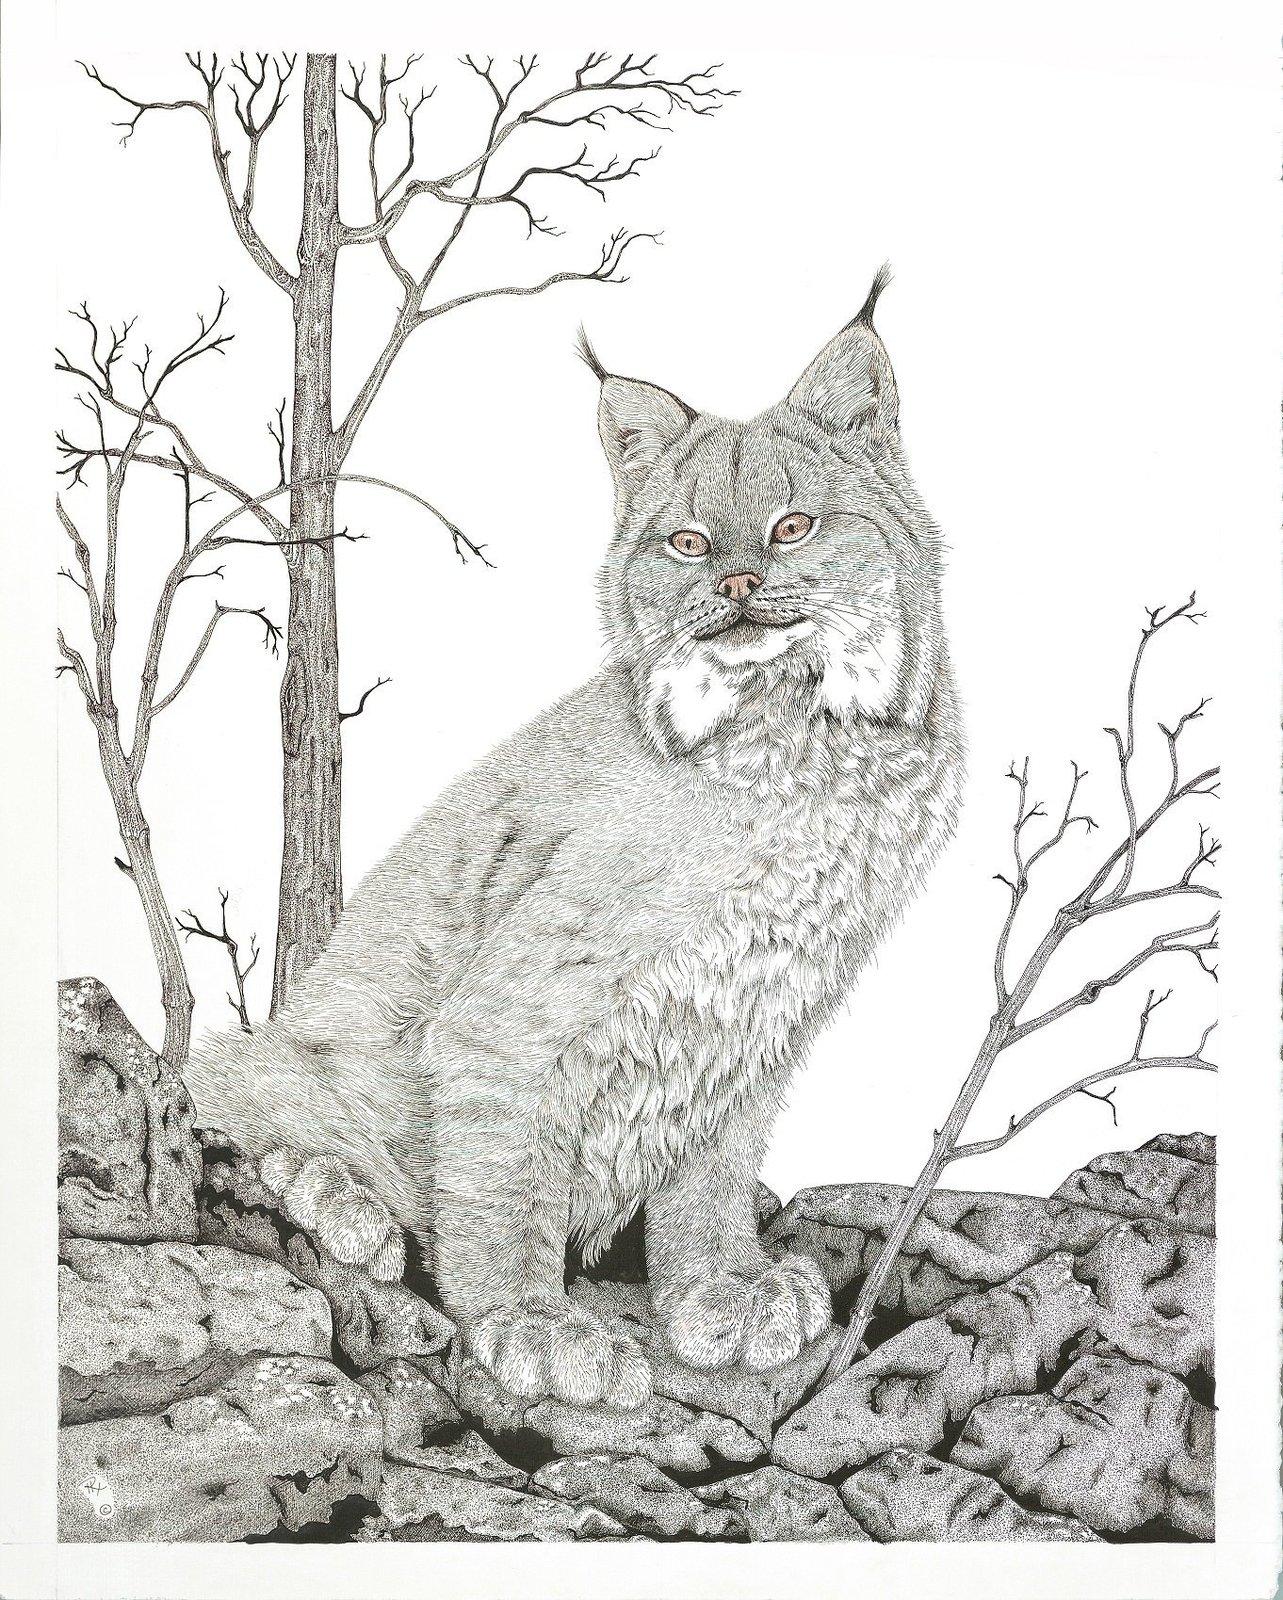 Lynx, Bob Cat, Wild Cat Framed Matted Wildlife Art Print, Pen and Ink, Animal Ar